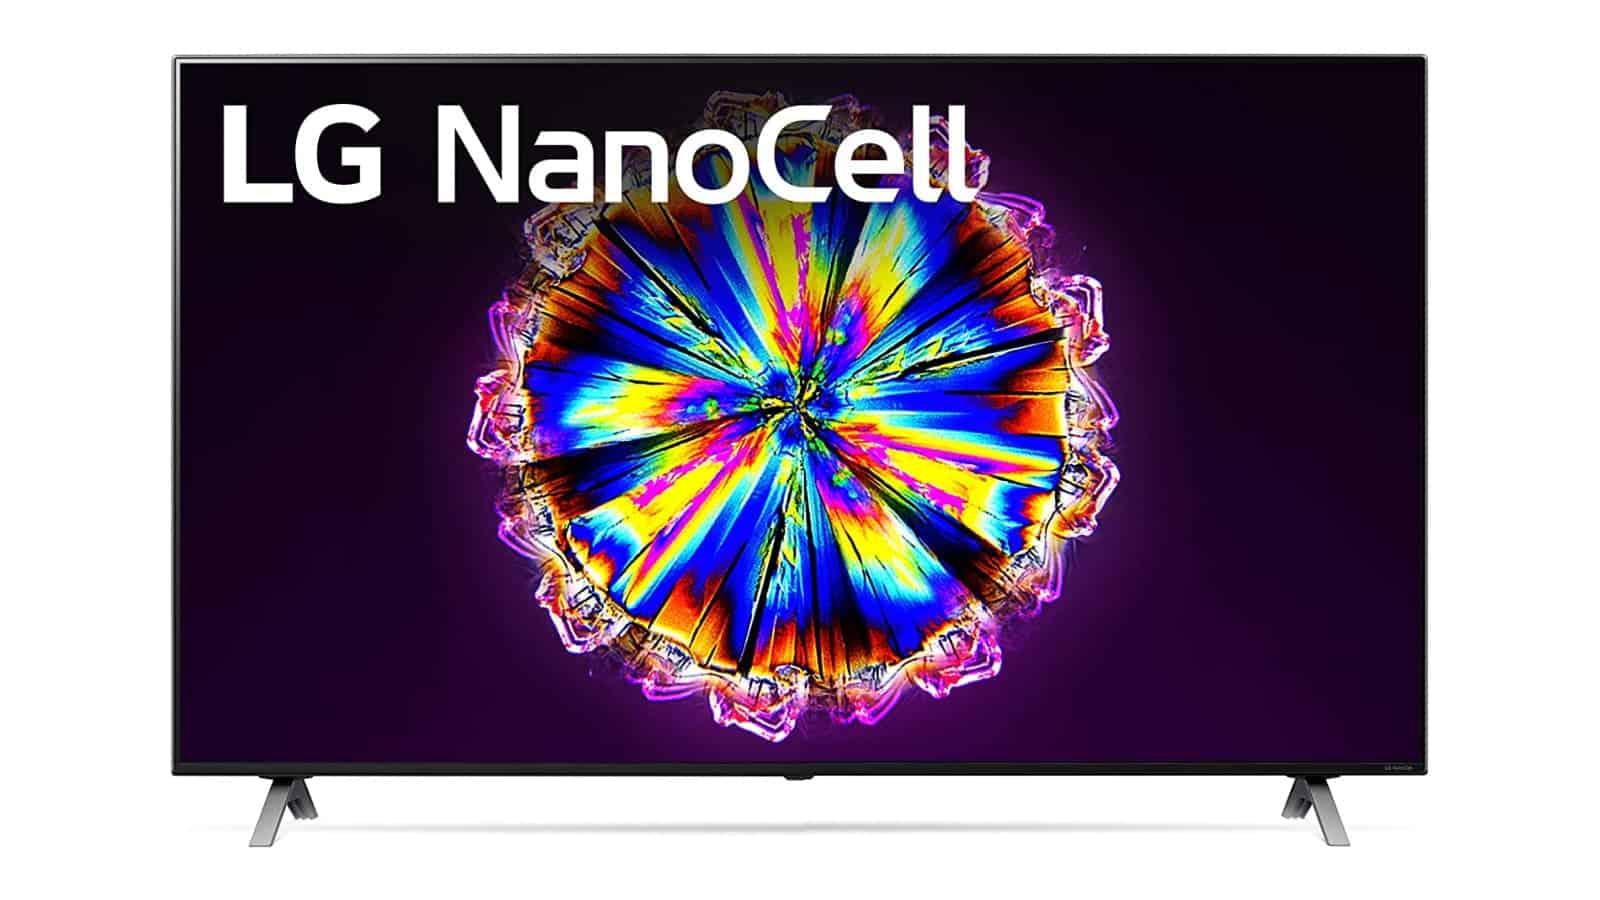 LG NanoCell 90 Series